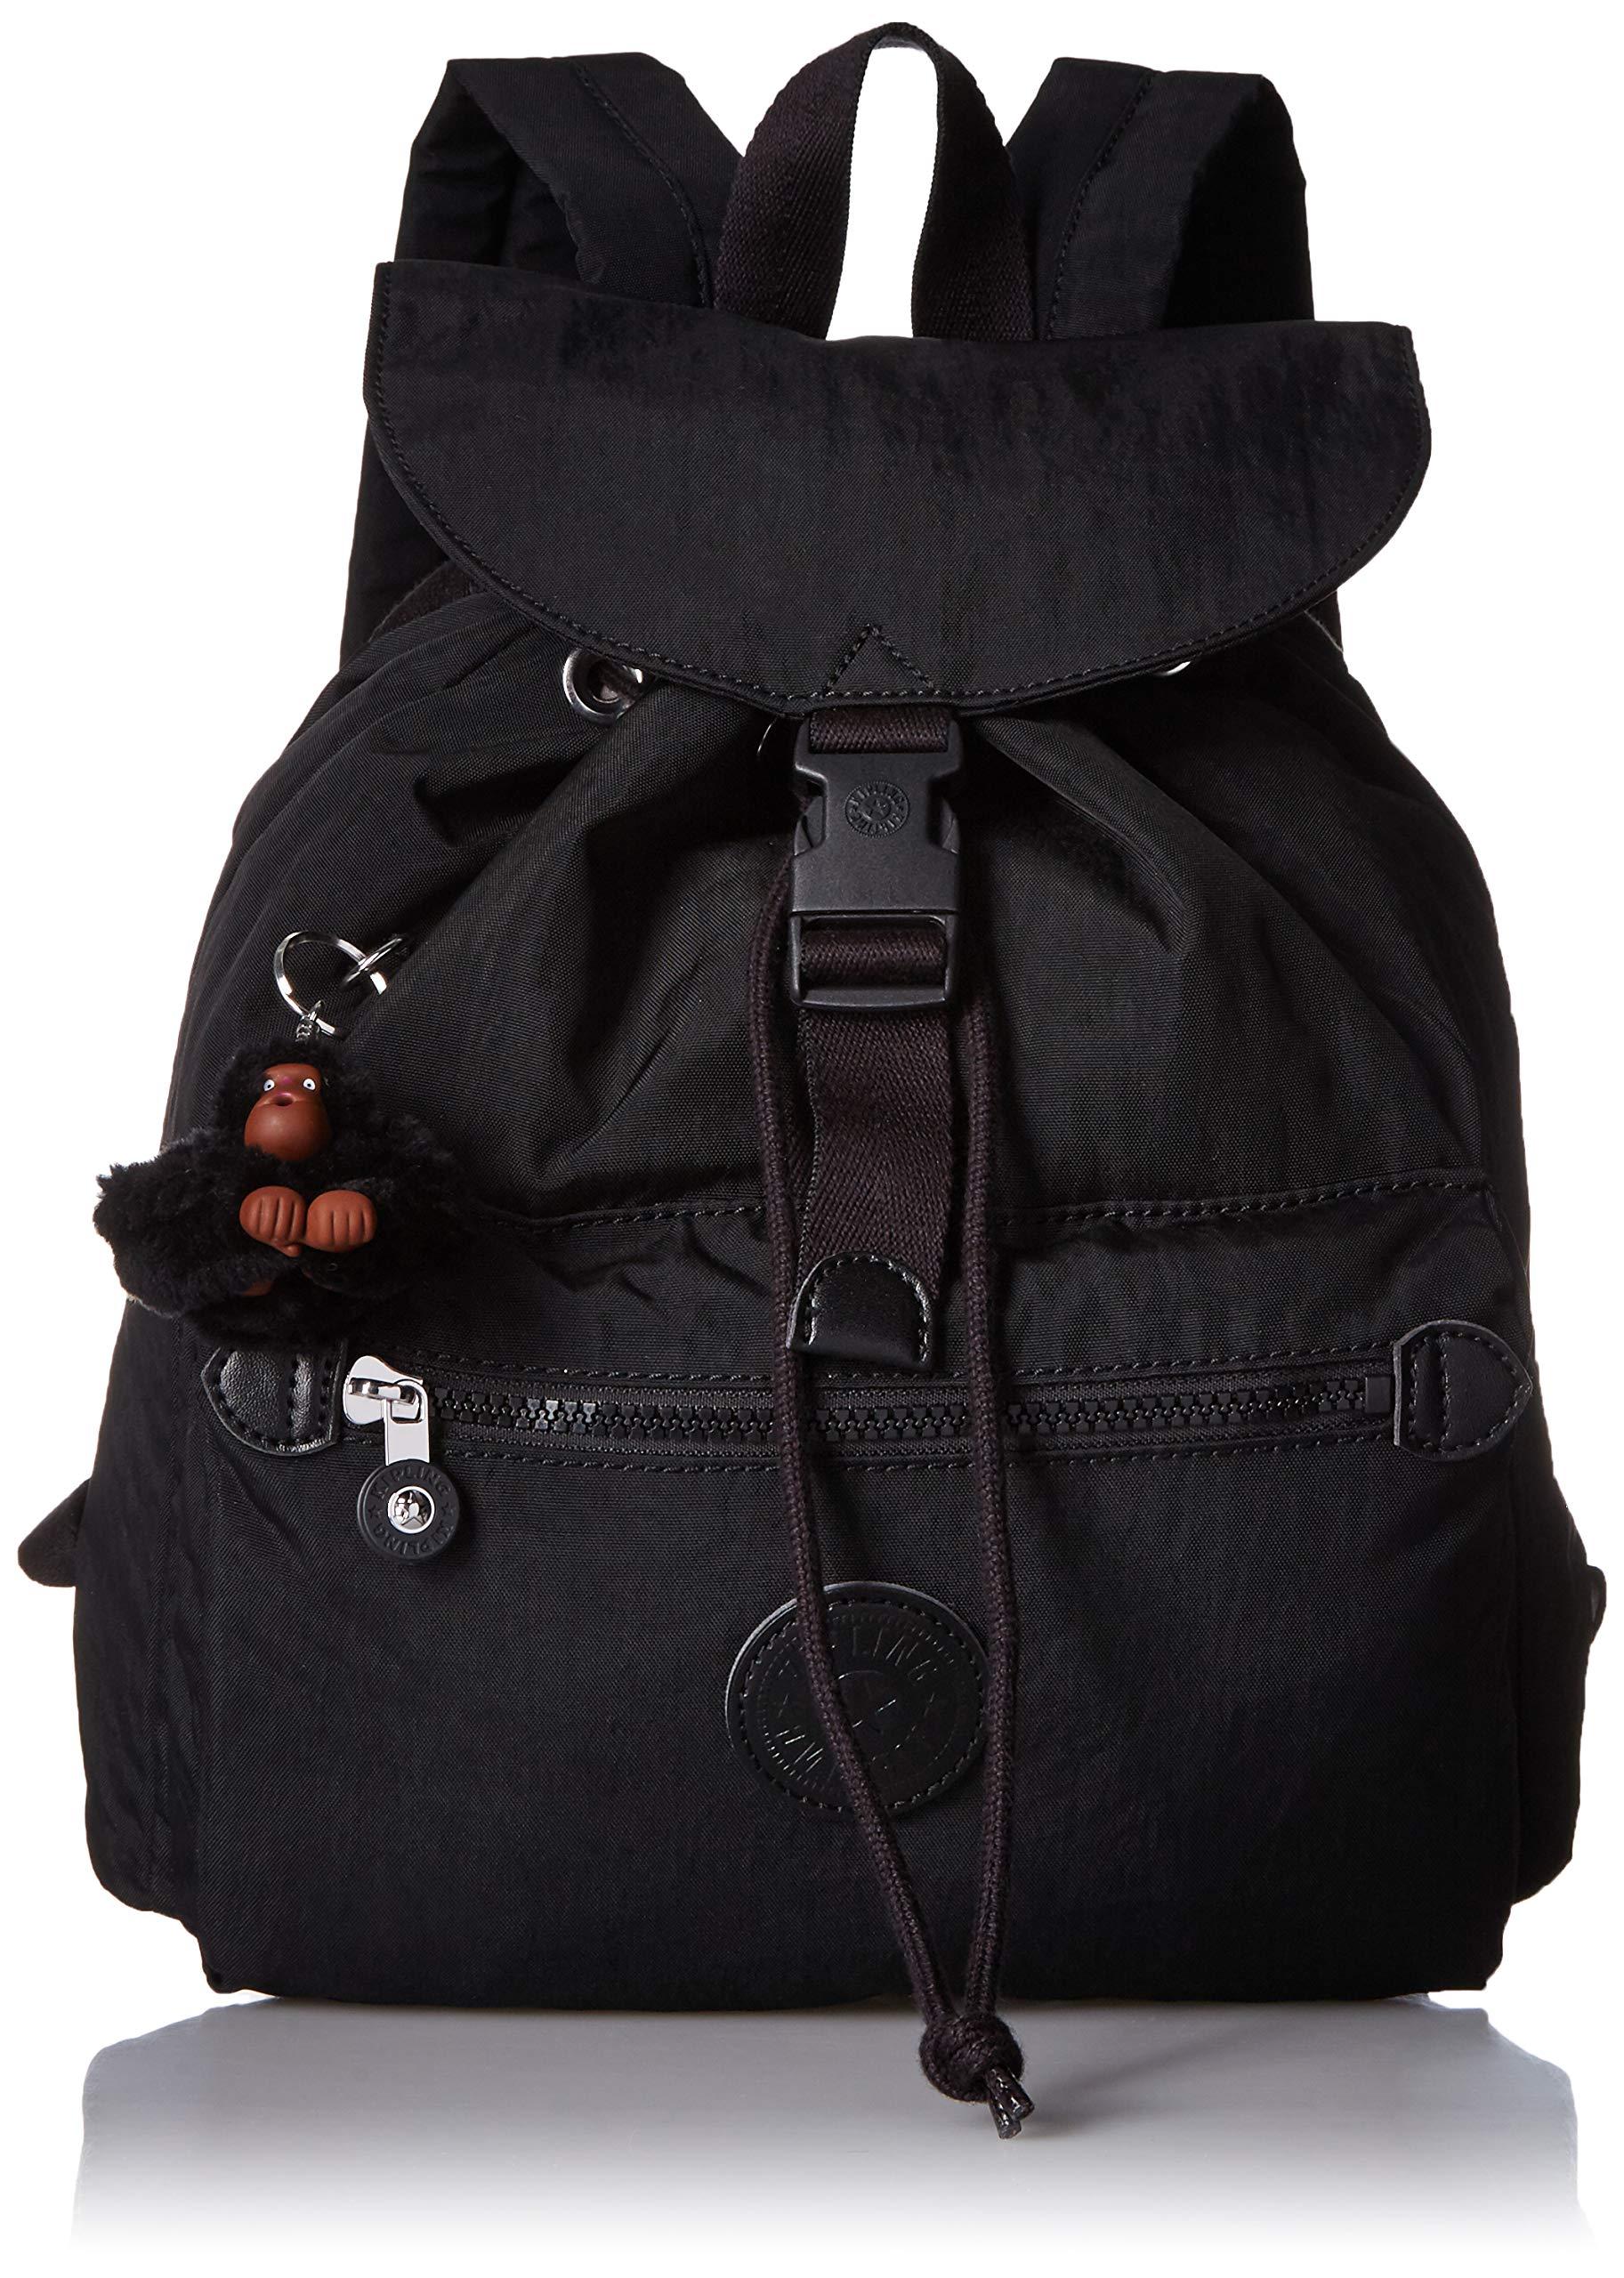 Kipling Keeper Small, Padded, Adjustable Backpack Straps, Drawstring Closure, Black